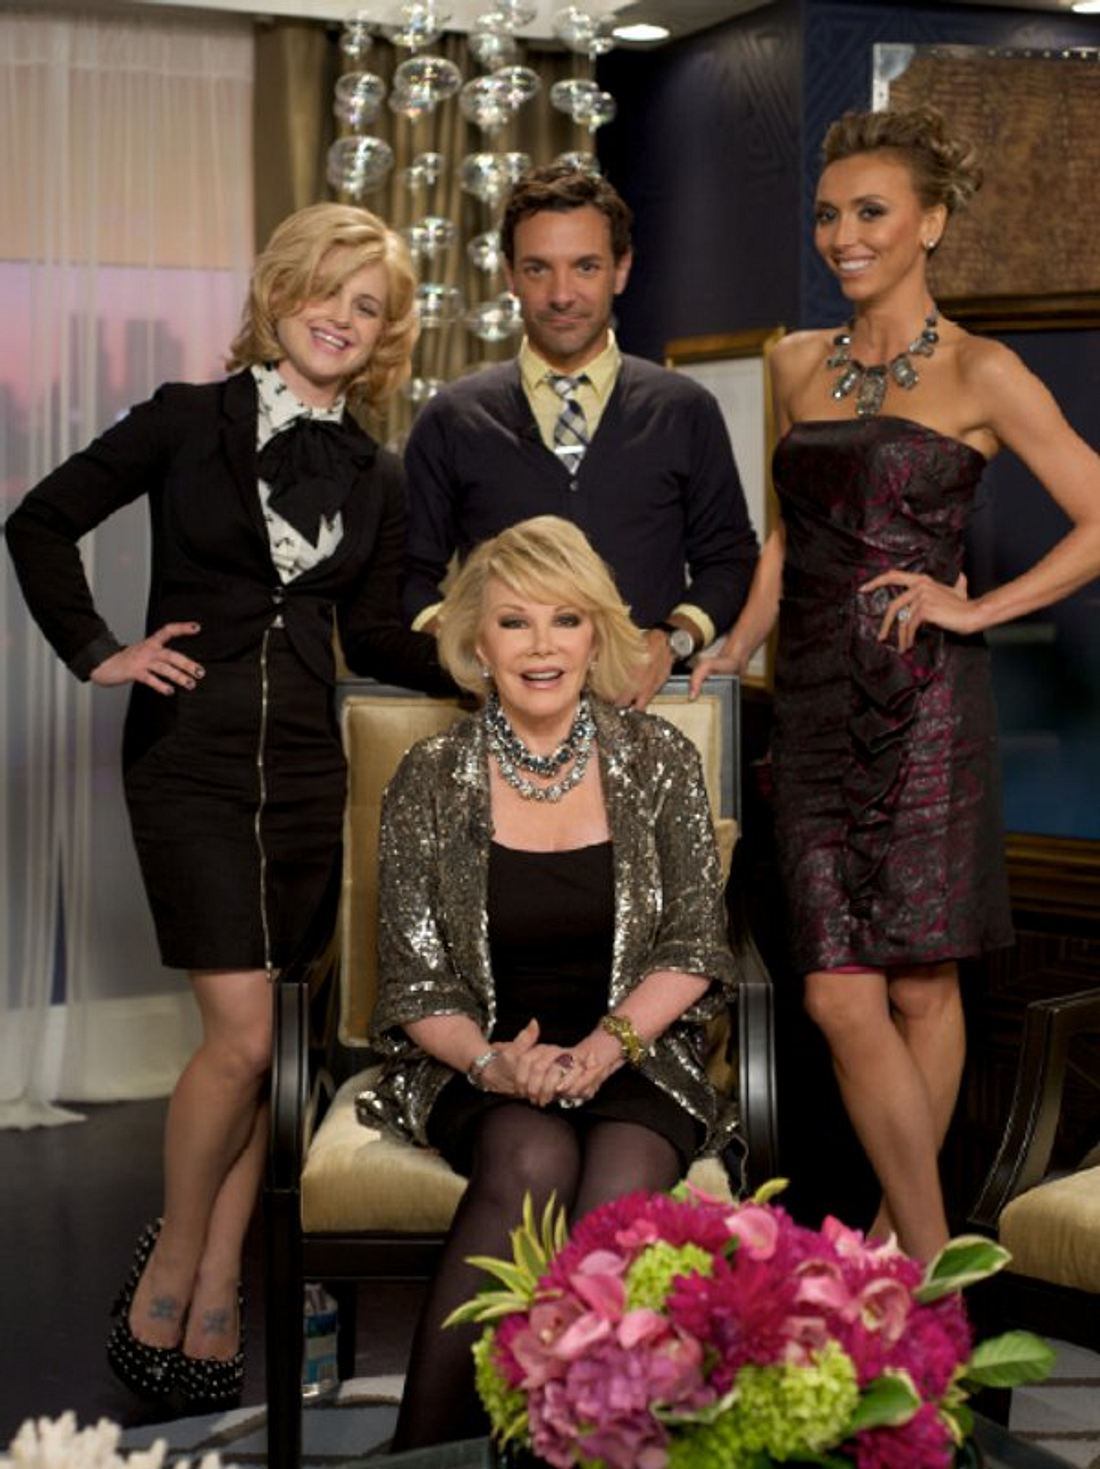 Zur Fashion Police gehören: Joan Rivers, Giuliana Rancic, George Kotsiopoulos und Kelly Osbourne